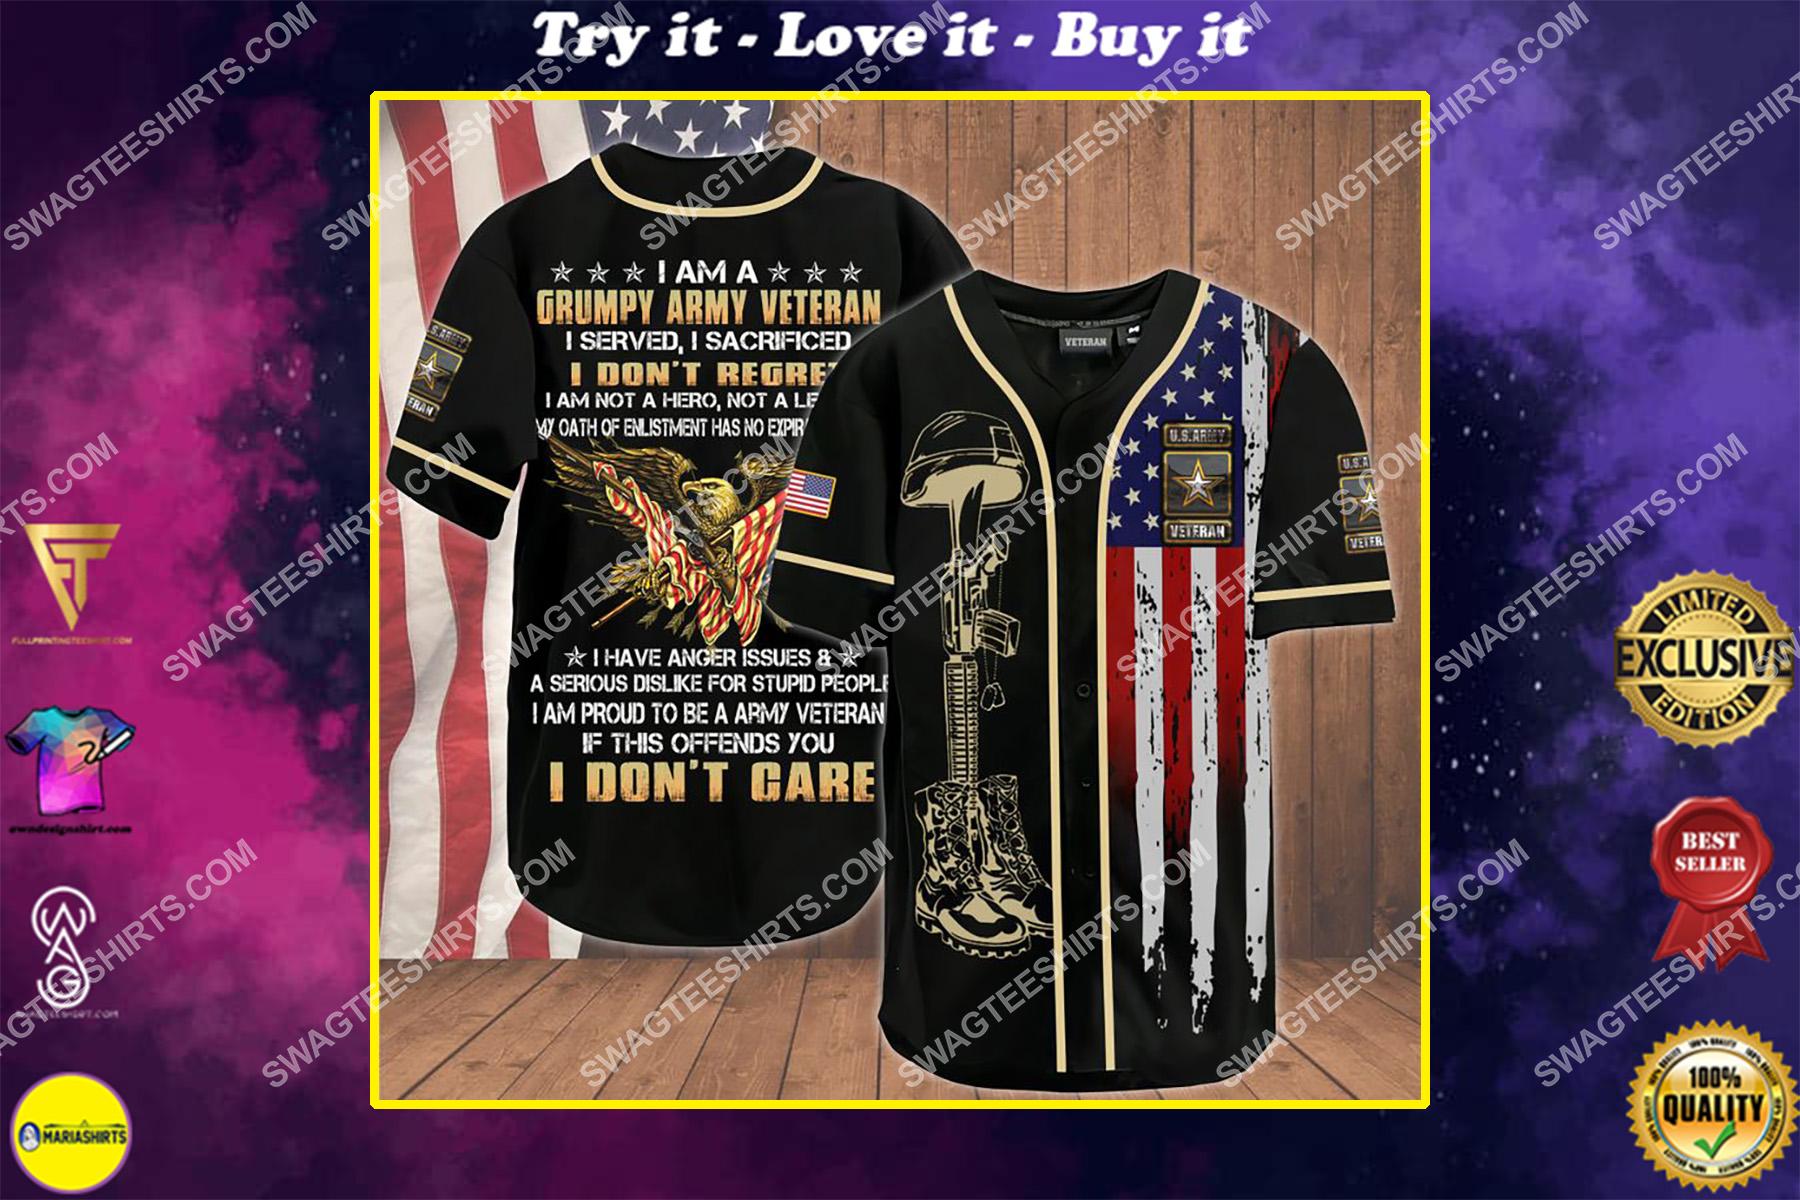 i am a grumpy old army veteran i served i sacrificed i don't regret i am not a hero not a legend baseball shirt